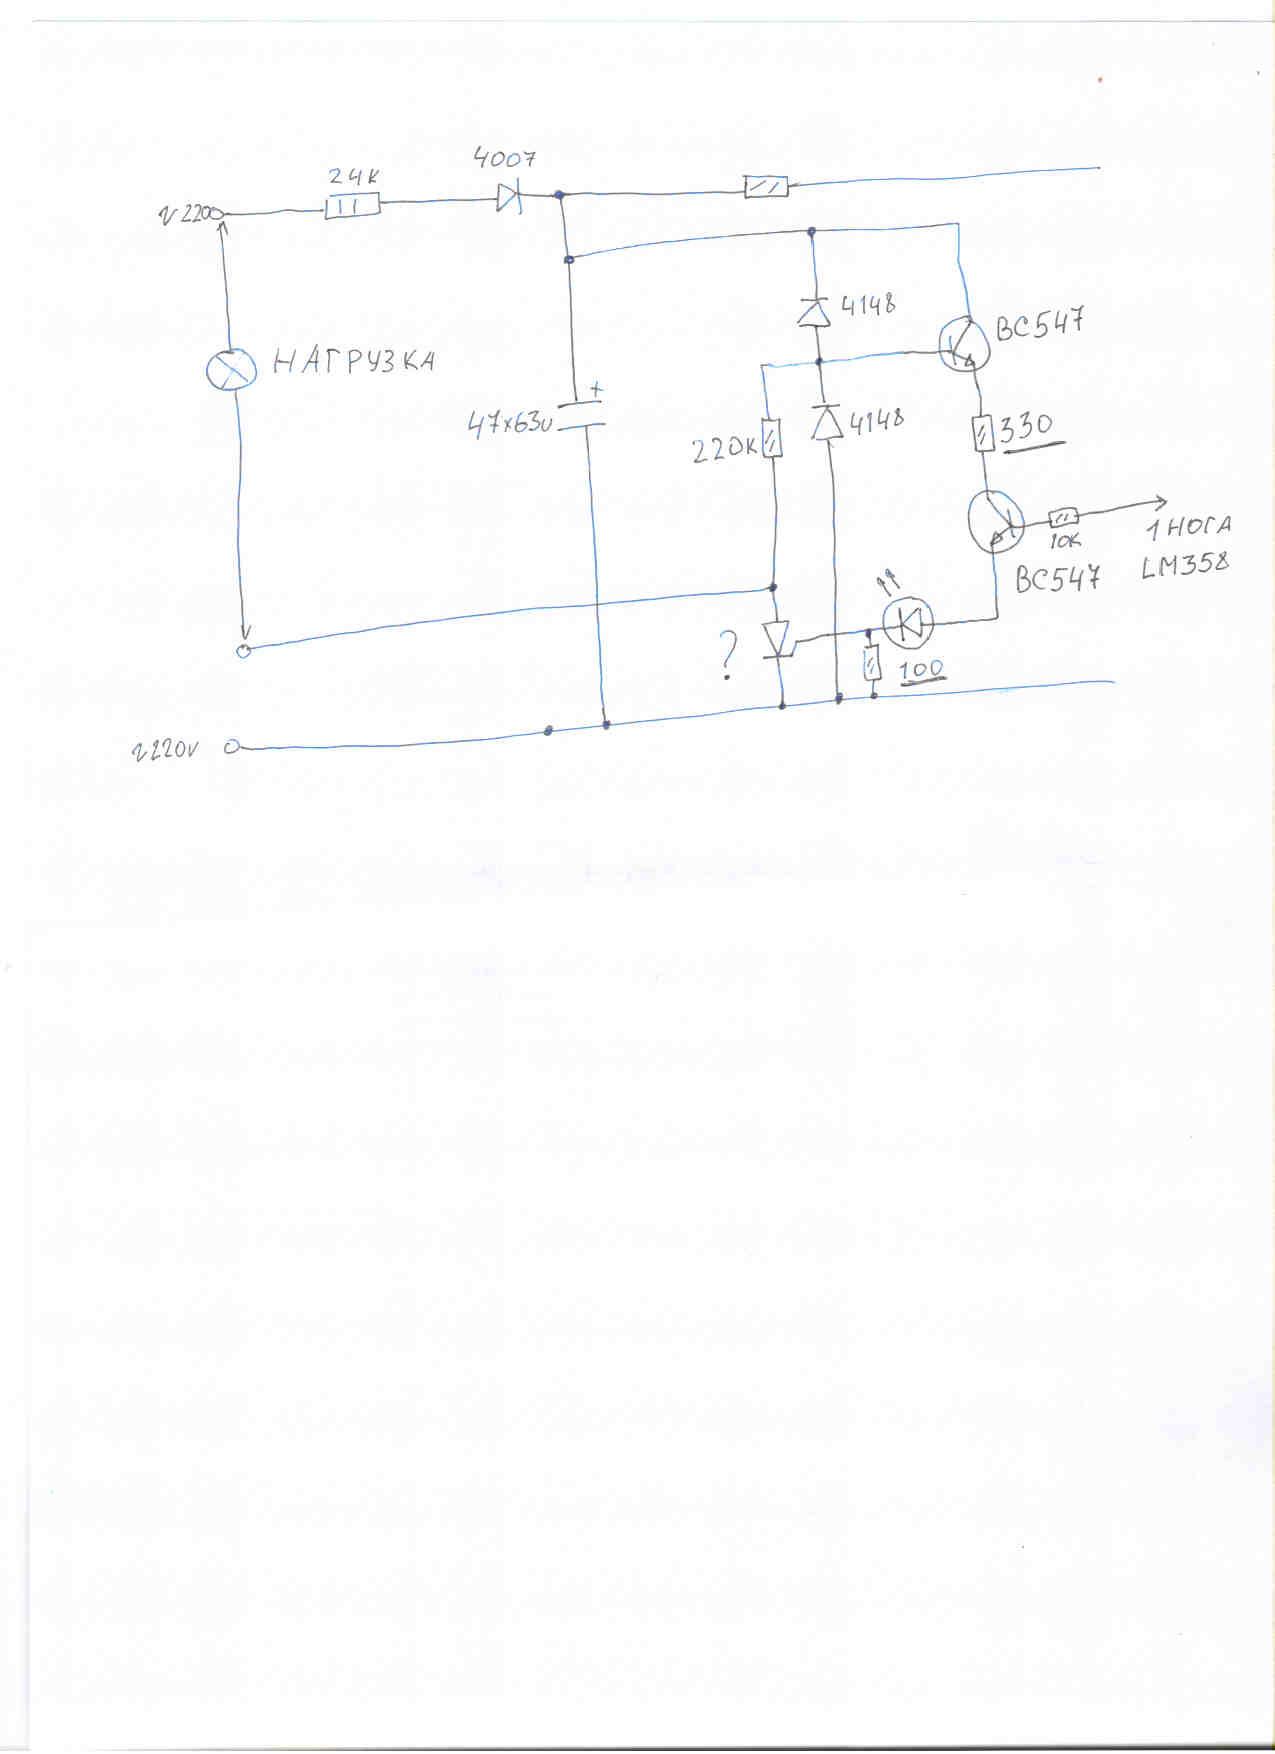 Схема терморегулятора на симисторе для инкубатора